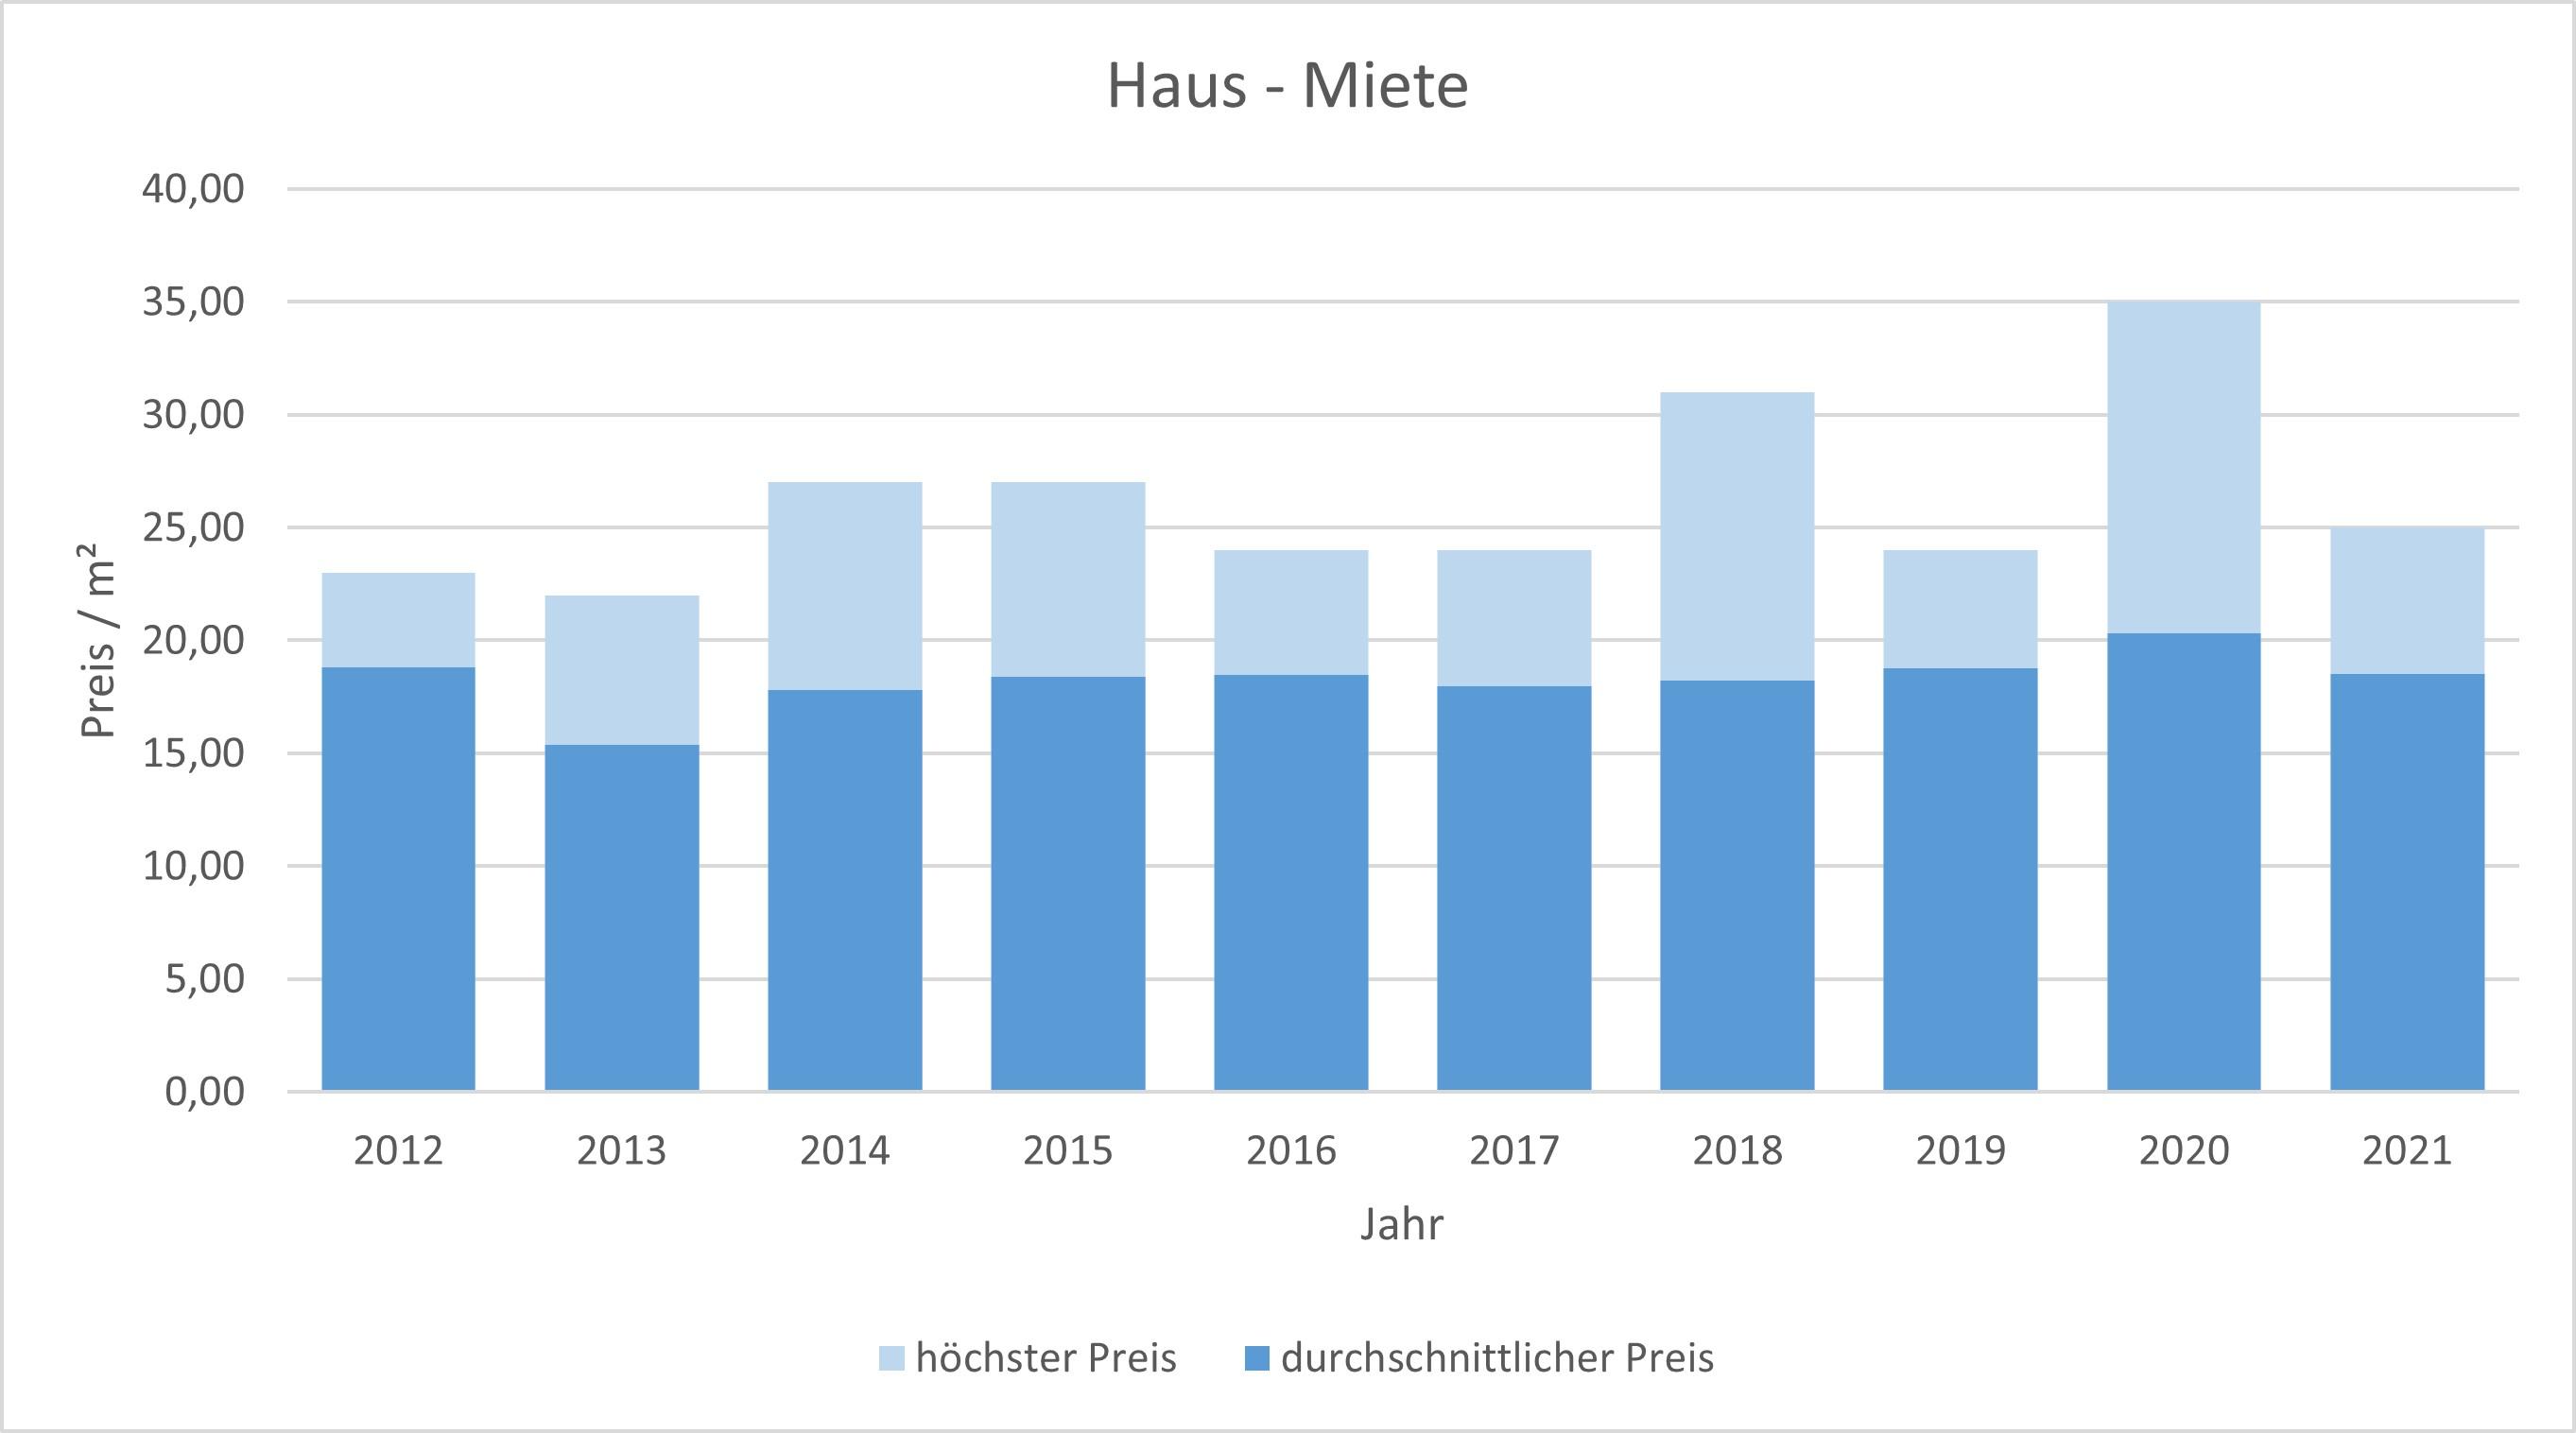 München - Harlaching Haus mieten vermieten Preis Bewertung Makler 2019 2020 2021 www.happy-immo.de